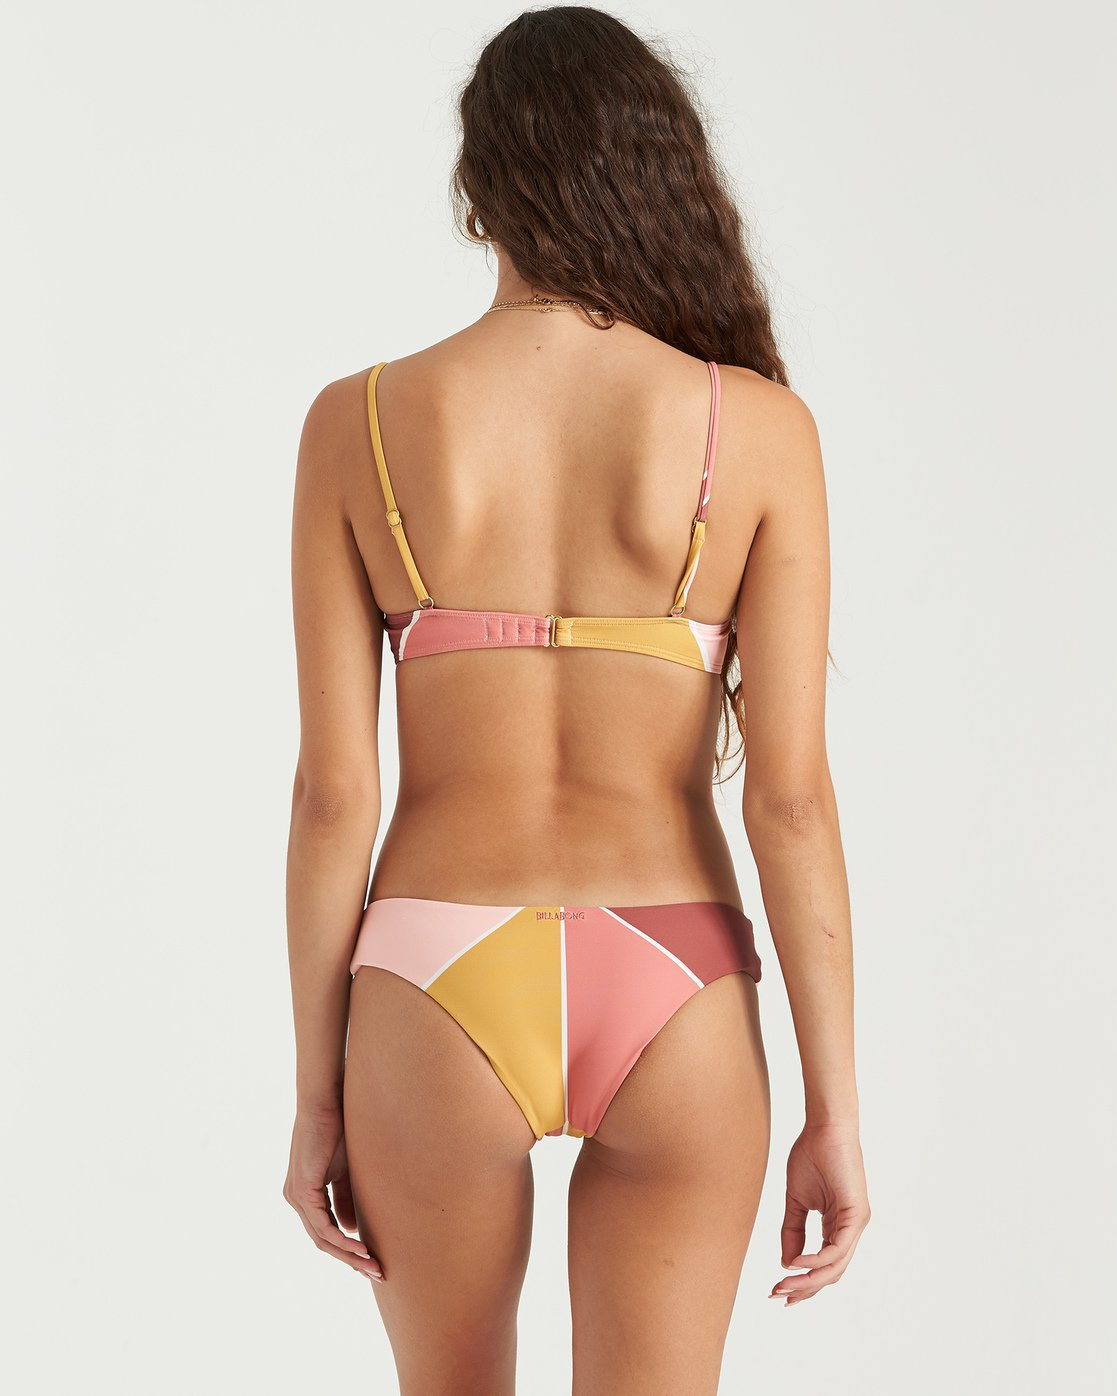 In The Rays Bralette Bikini Top